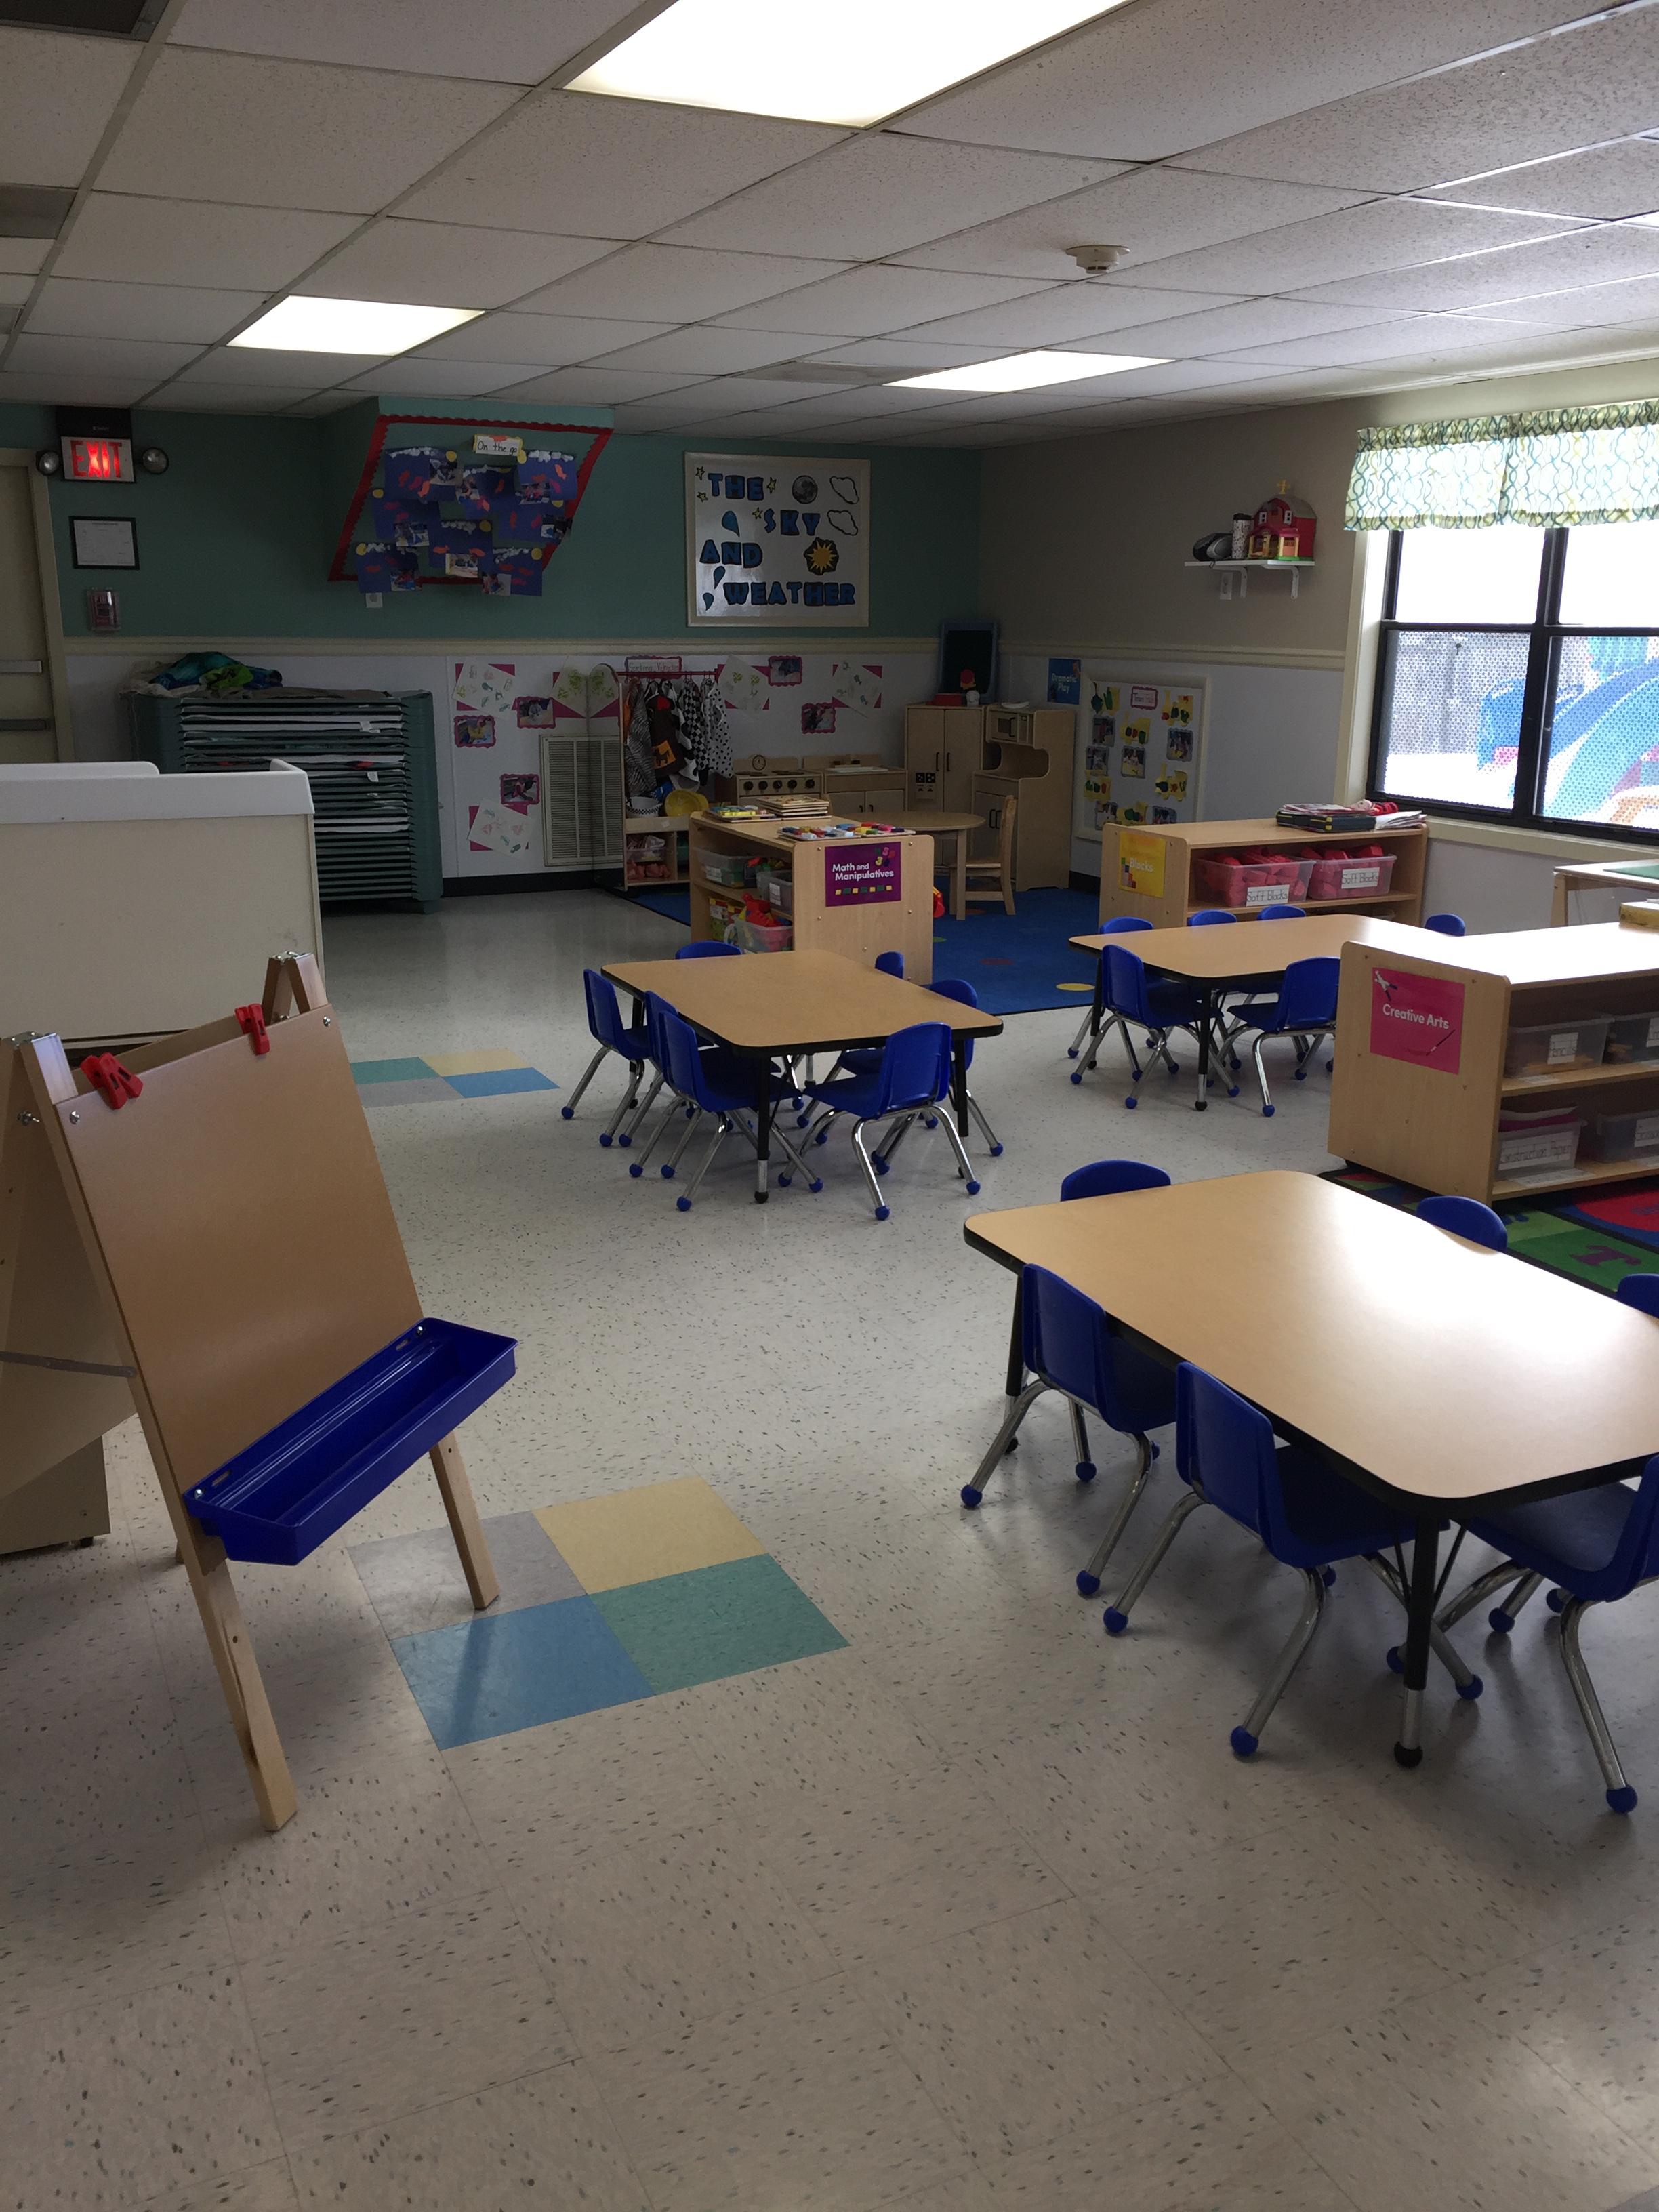 preschools in portsmouth va churchland kindercare daycare preschool amp early 78260